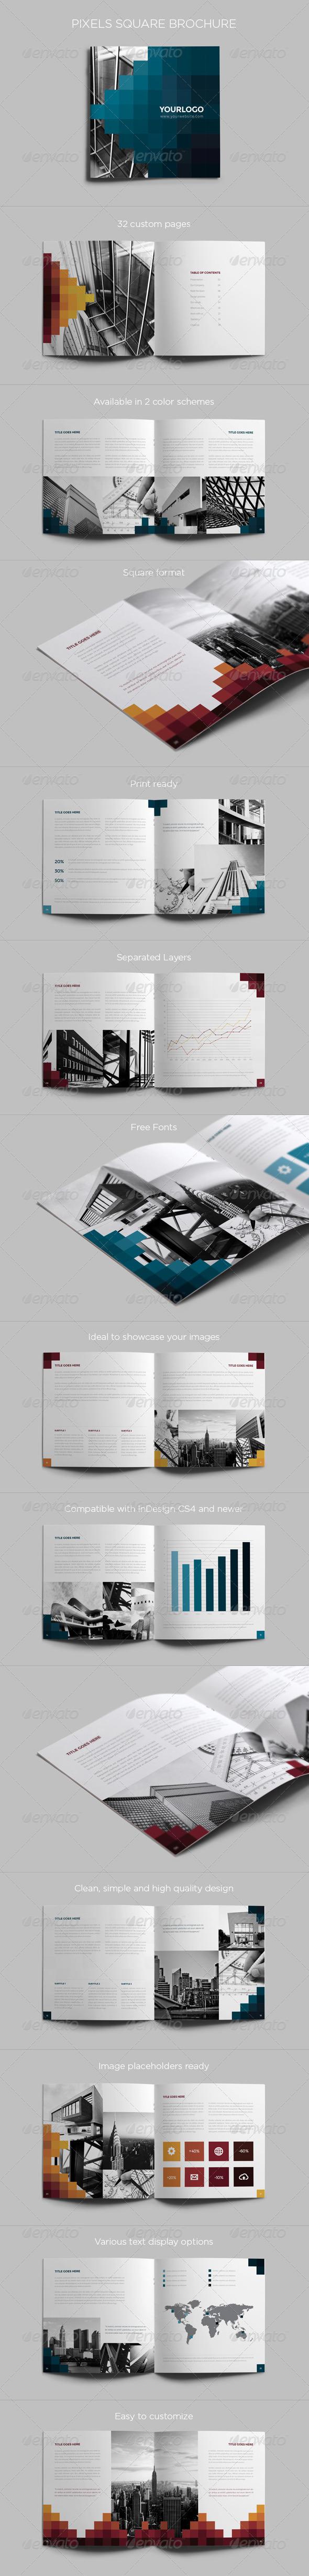 GraphicRiver Pixels Square Brochure 6586956